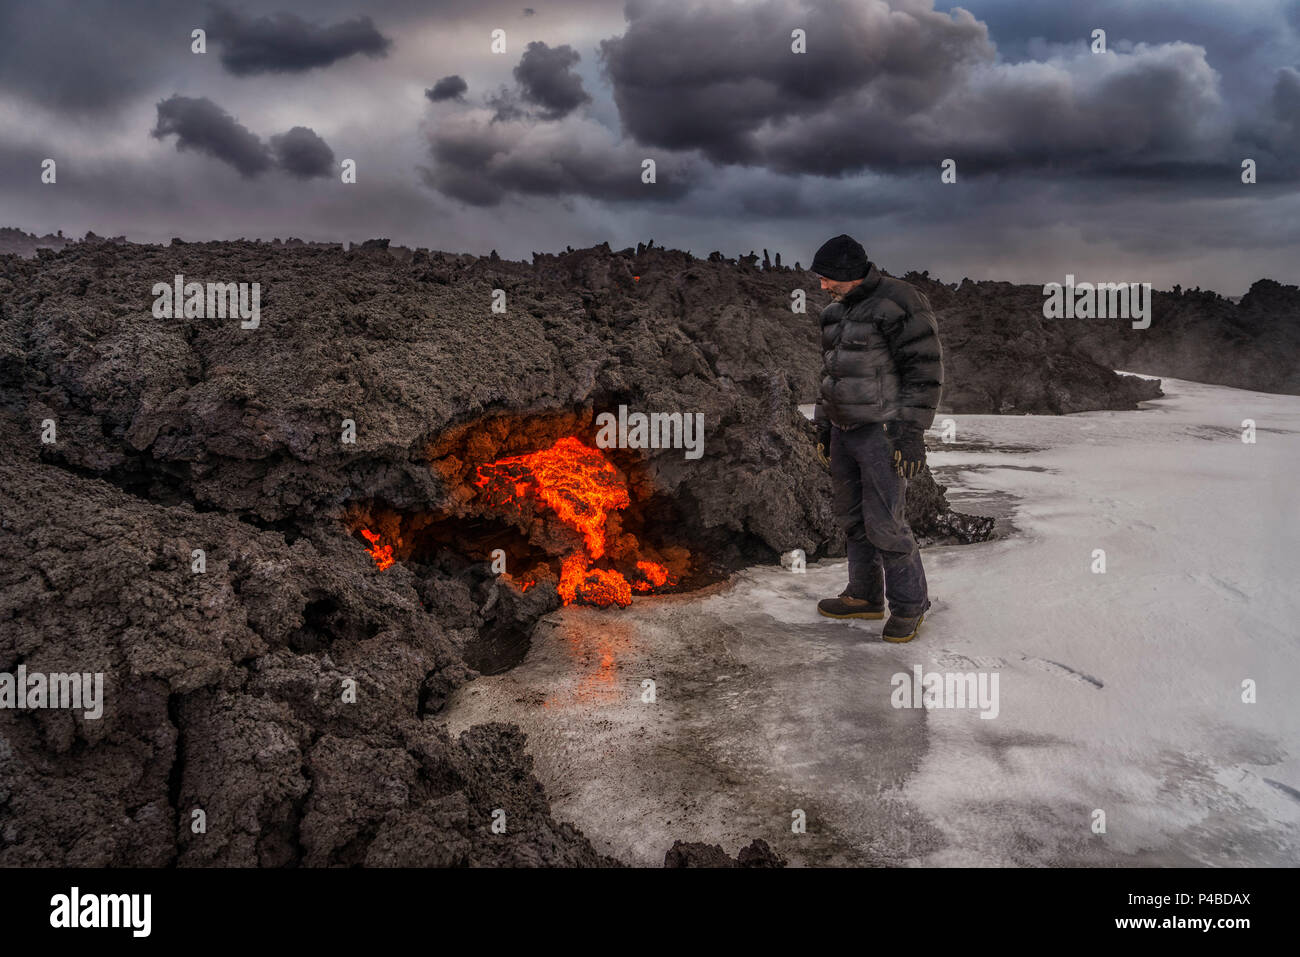 Glowing Lava flow, Holuhraun Fissure Eruption, Bardarbunga Volcano, Iceland - Stock Image